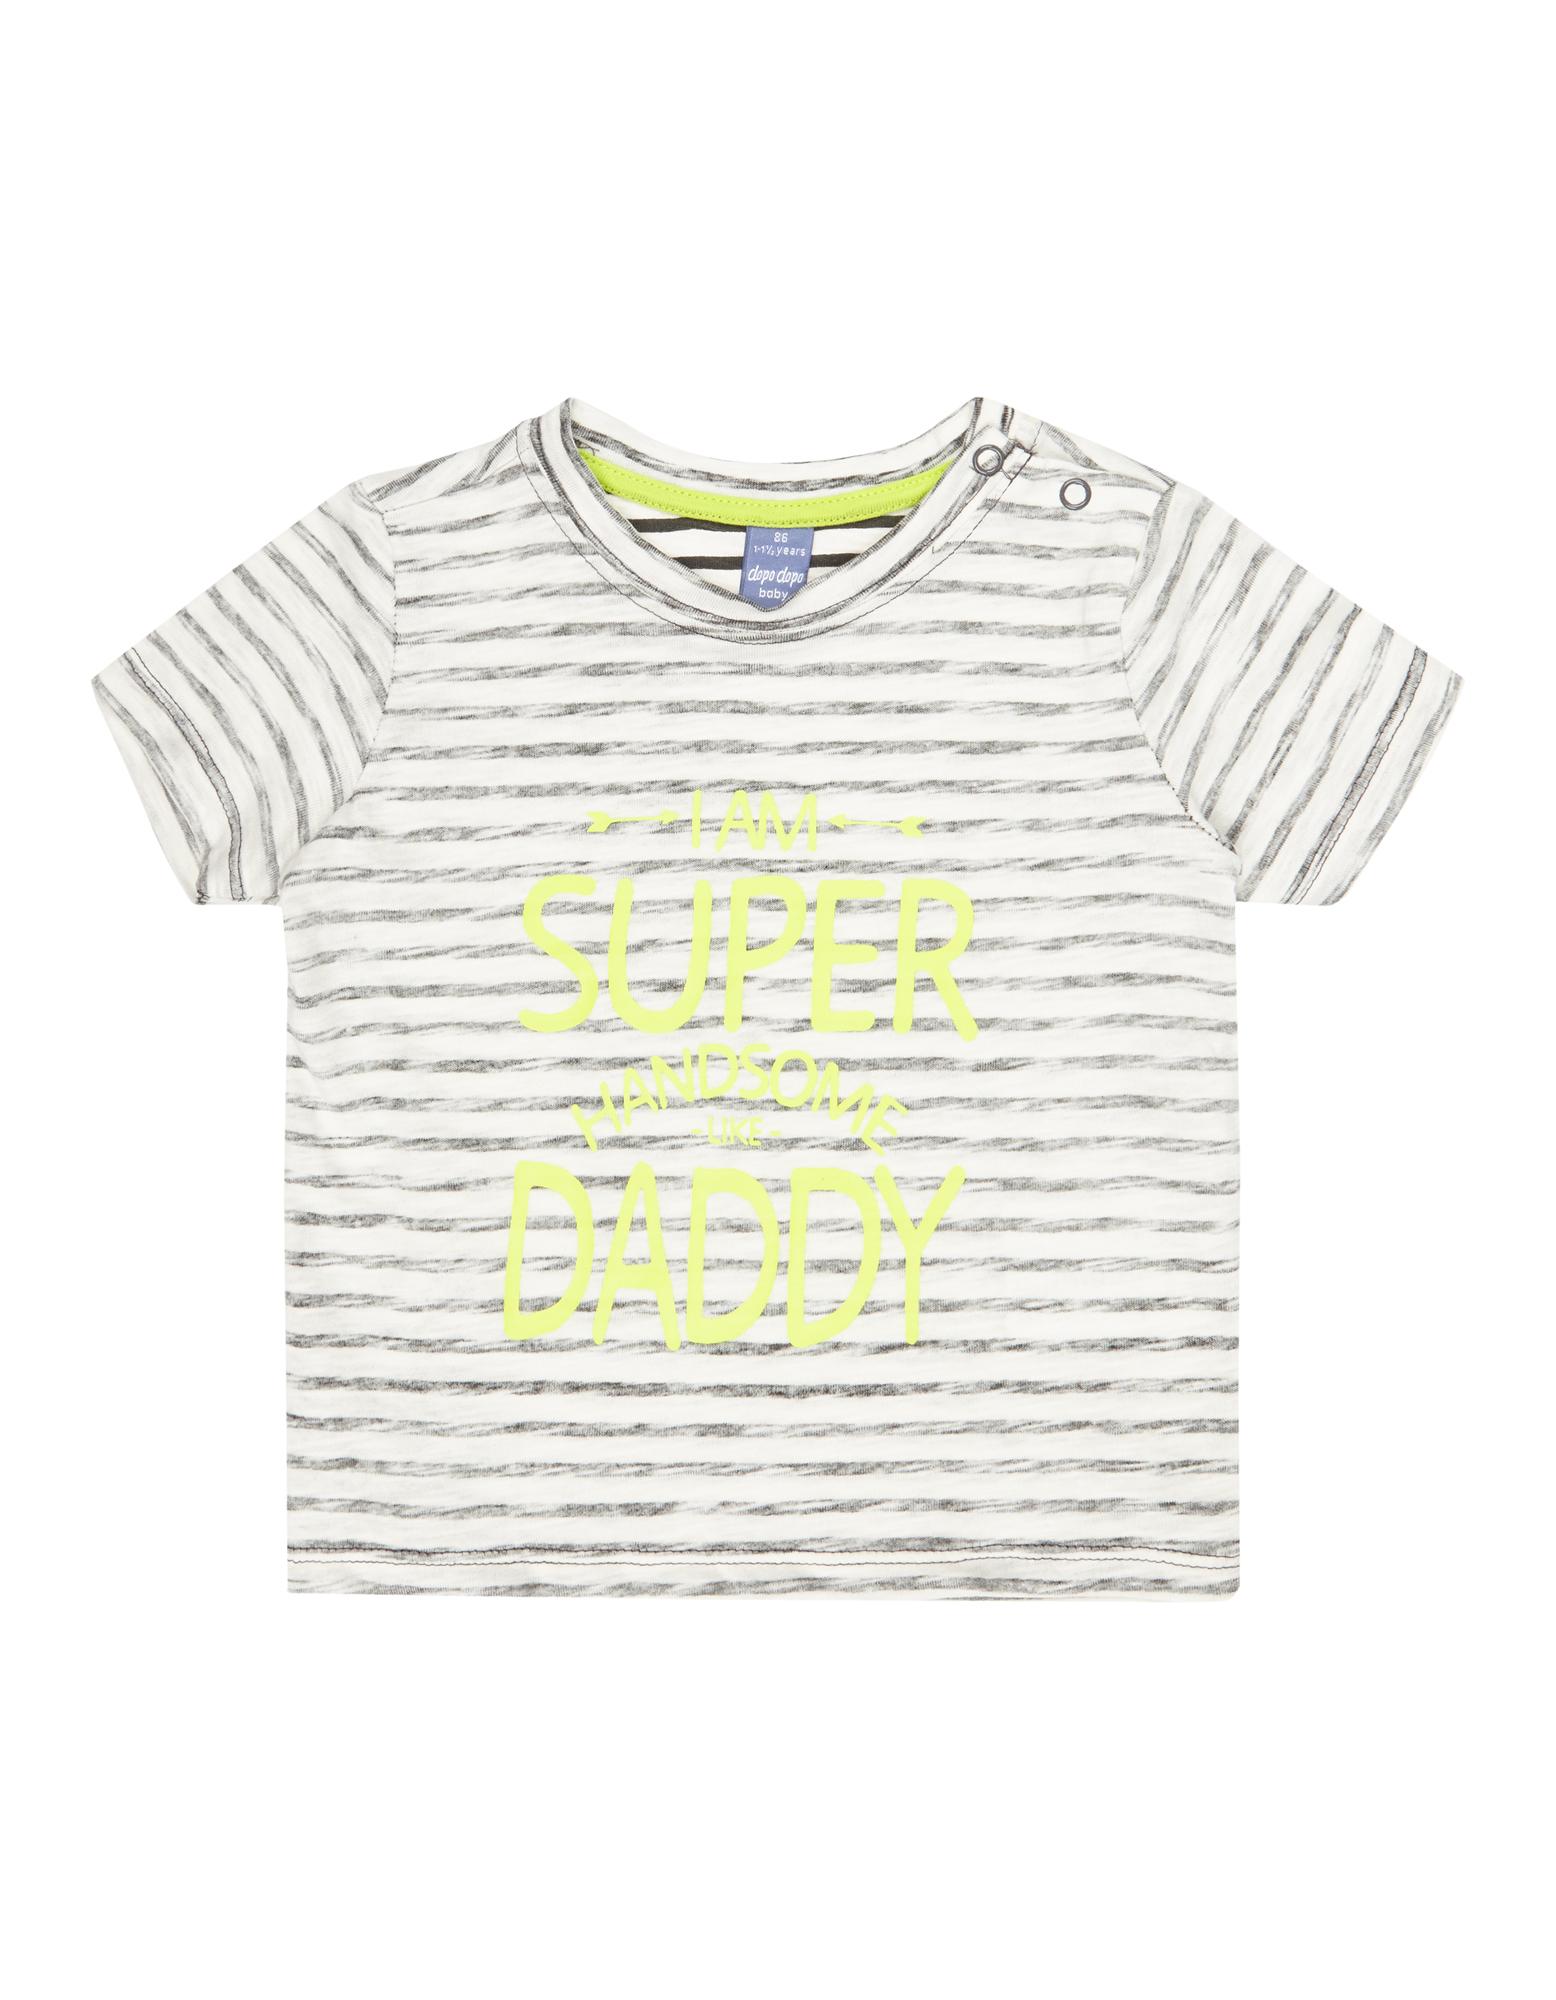 Polyester T Shirt Stinkt | RLDM